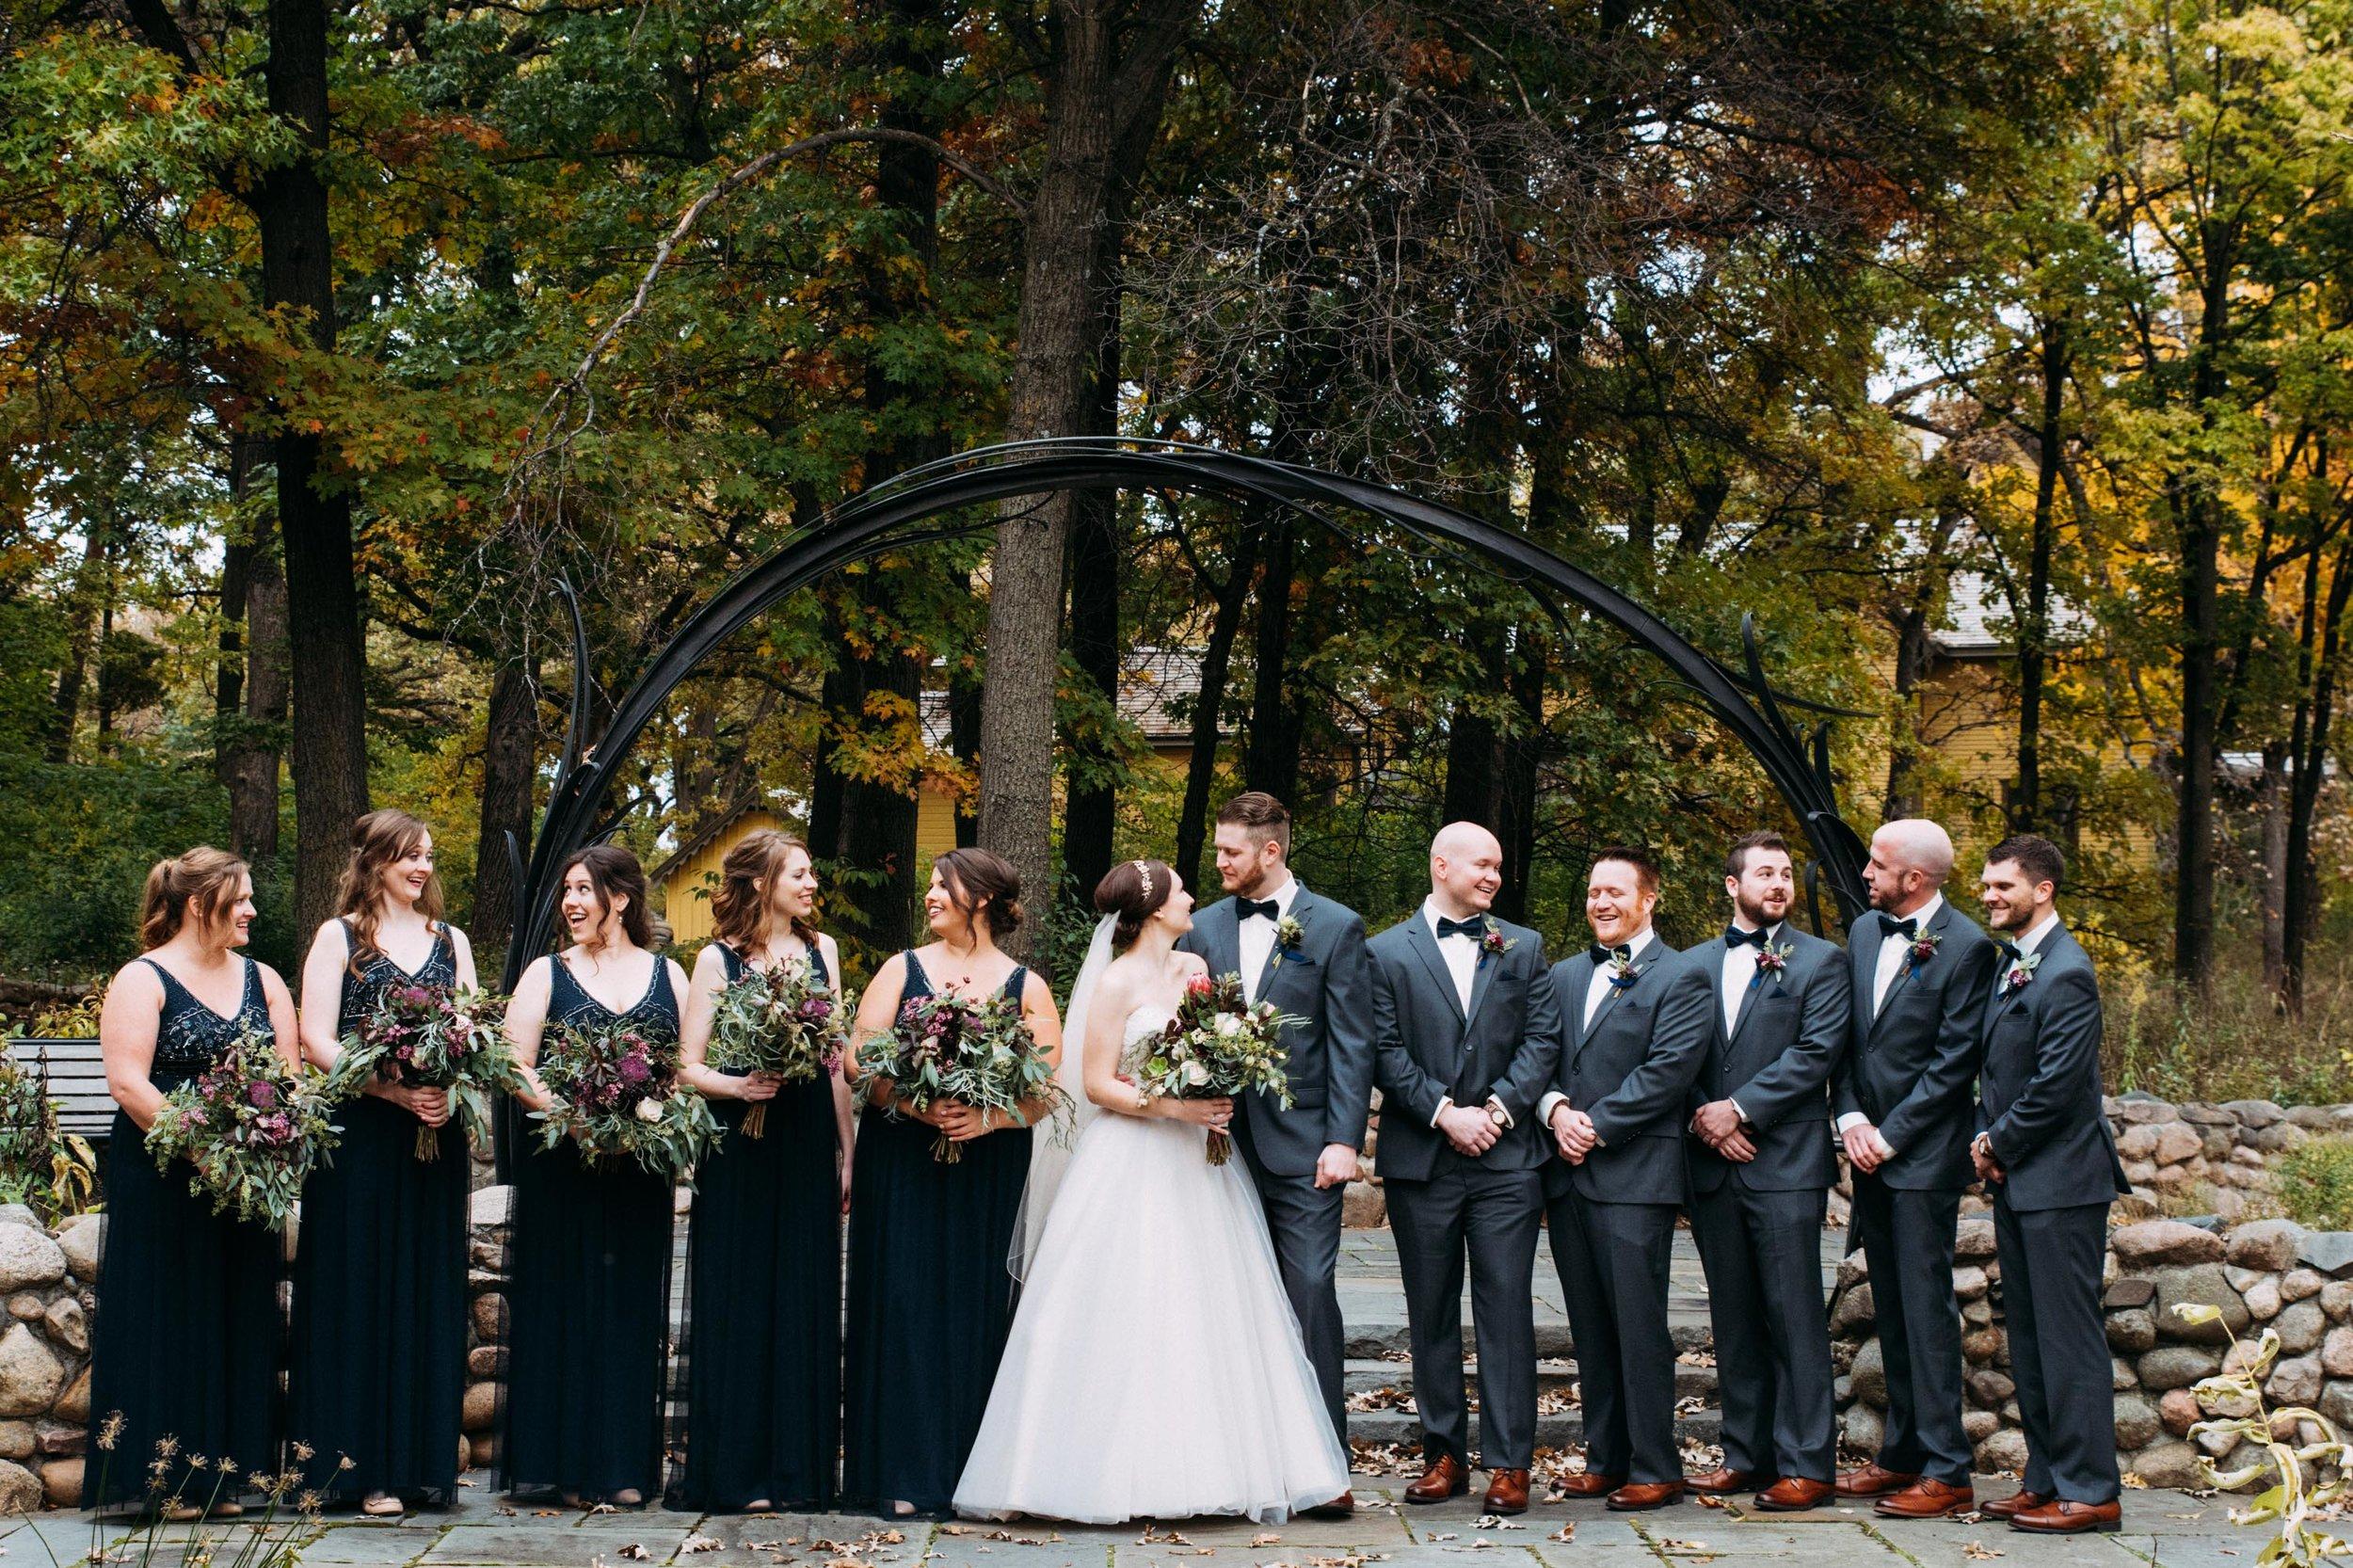 21-Sara_Tom_Wedding_Party_Portraits_Minneapolis_Wedding.jpg